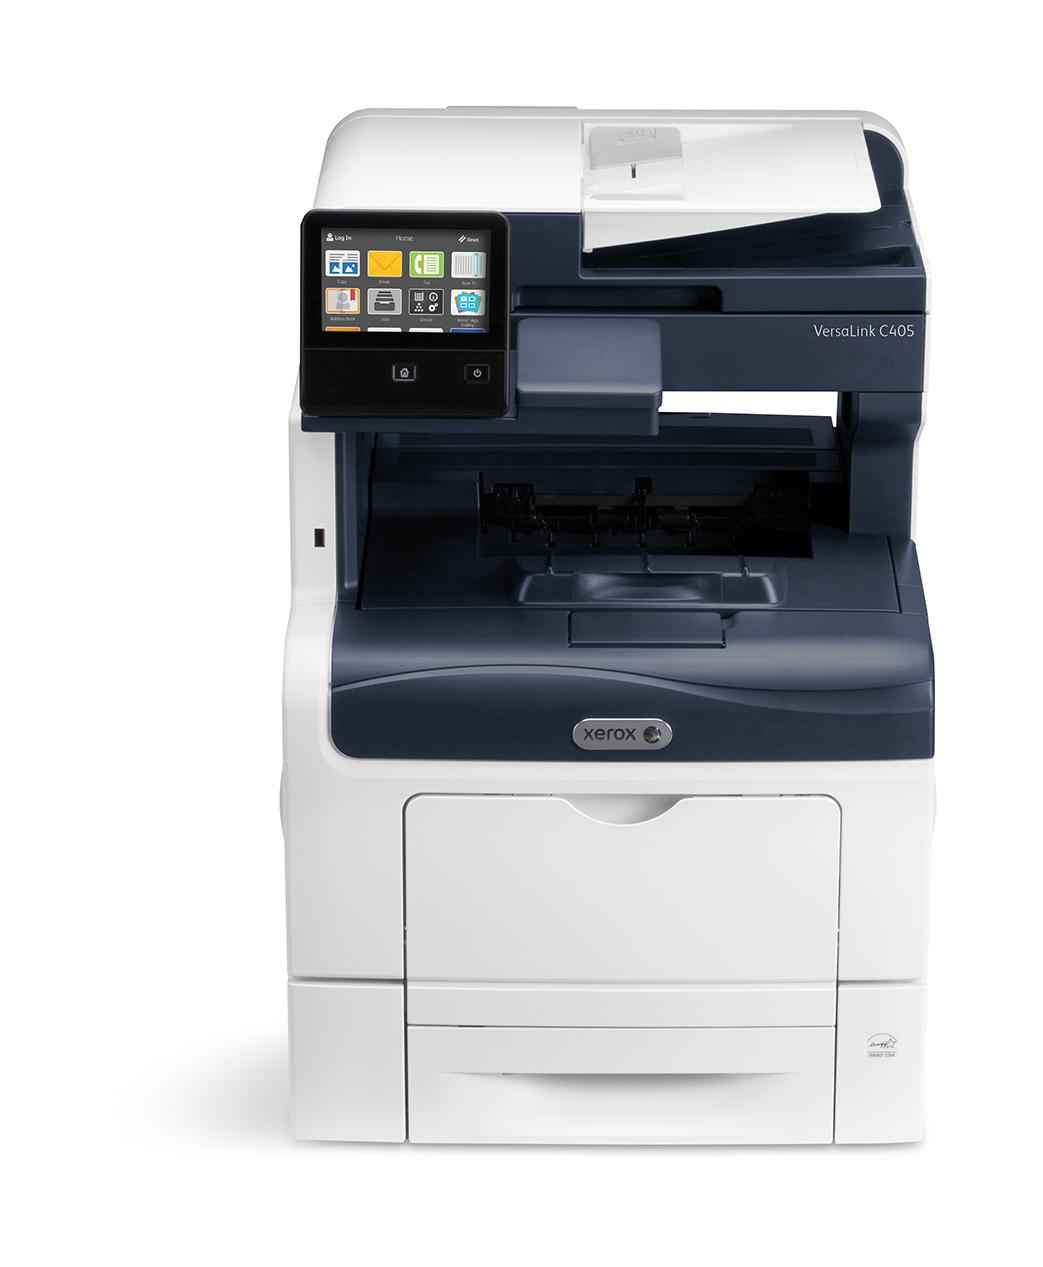 Xerox VersaLink Impresora C405 A4 35/35ppm Copia/Impresión/Escaneado/Fax de impresión a dos caras con PS3 PCL5e/6 y 2 bandejas de 700 hojas